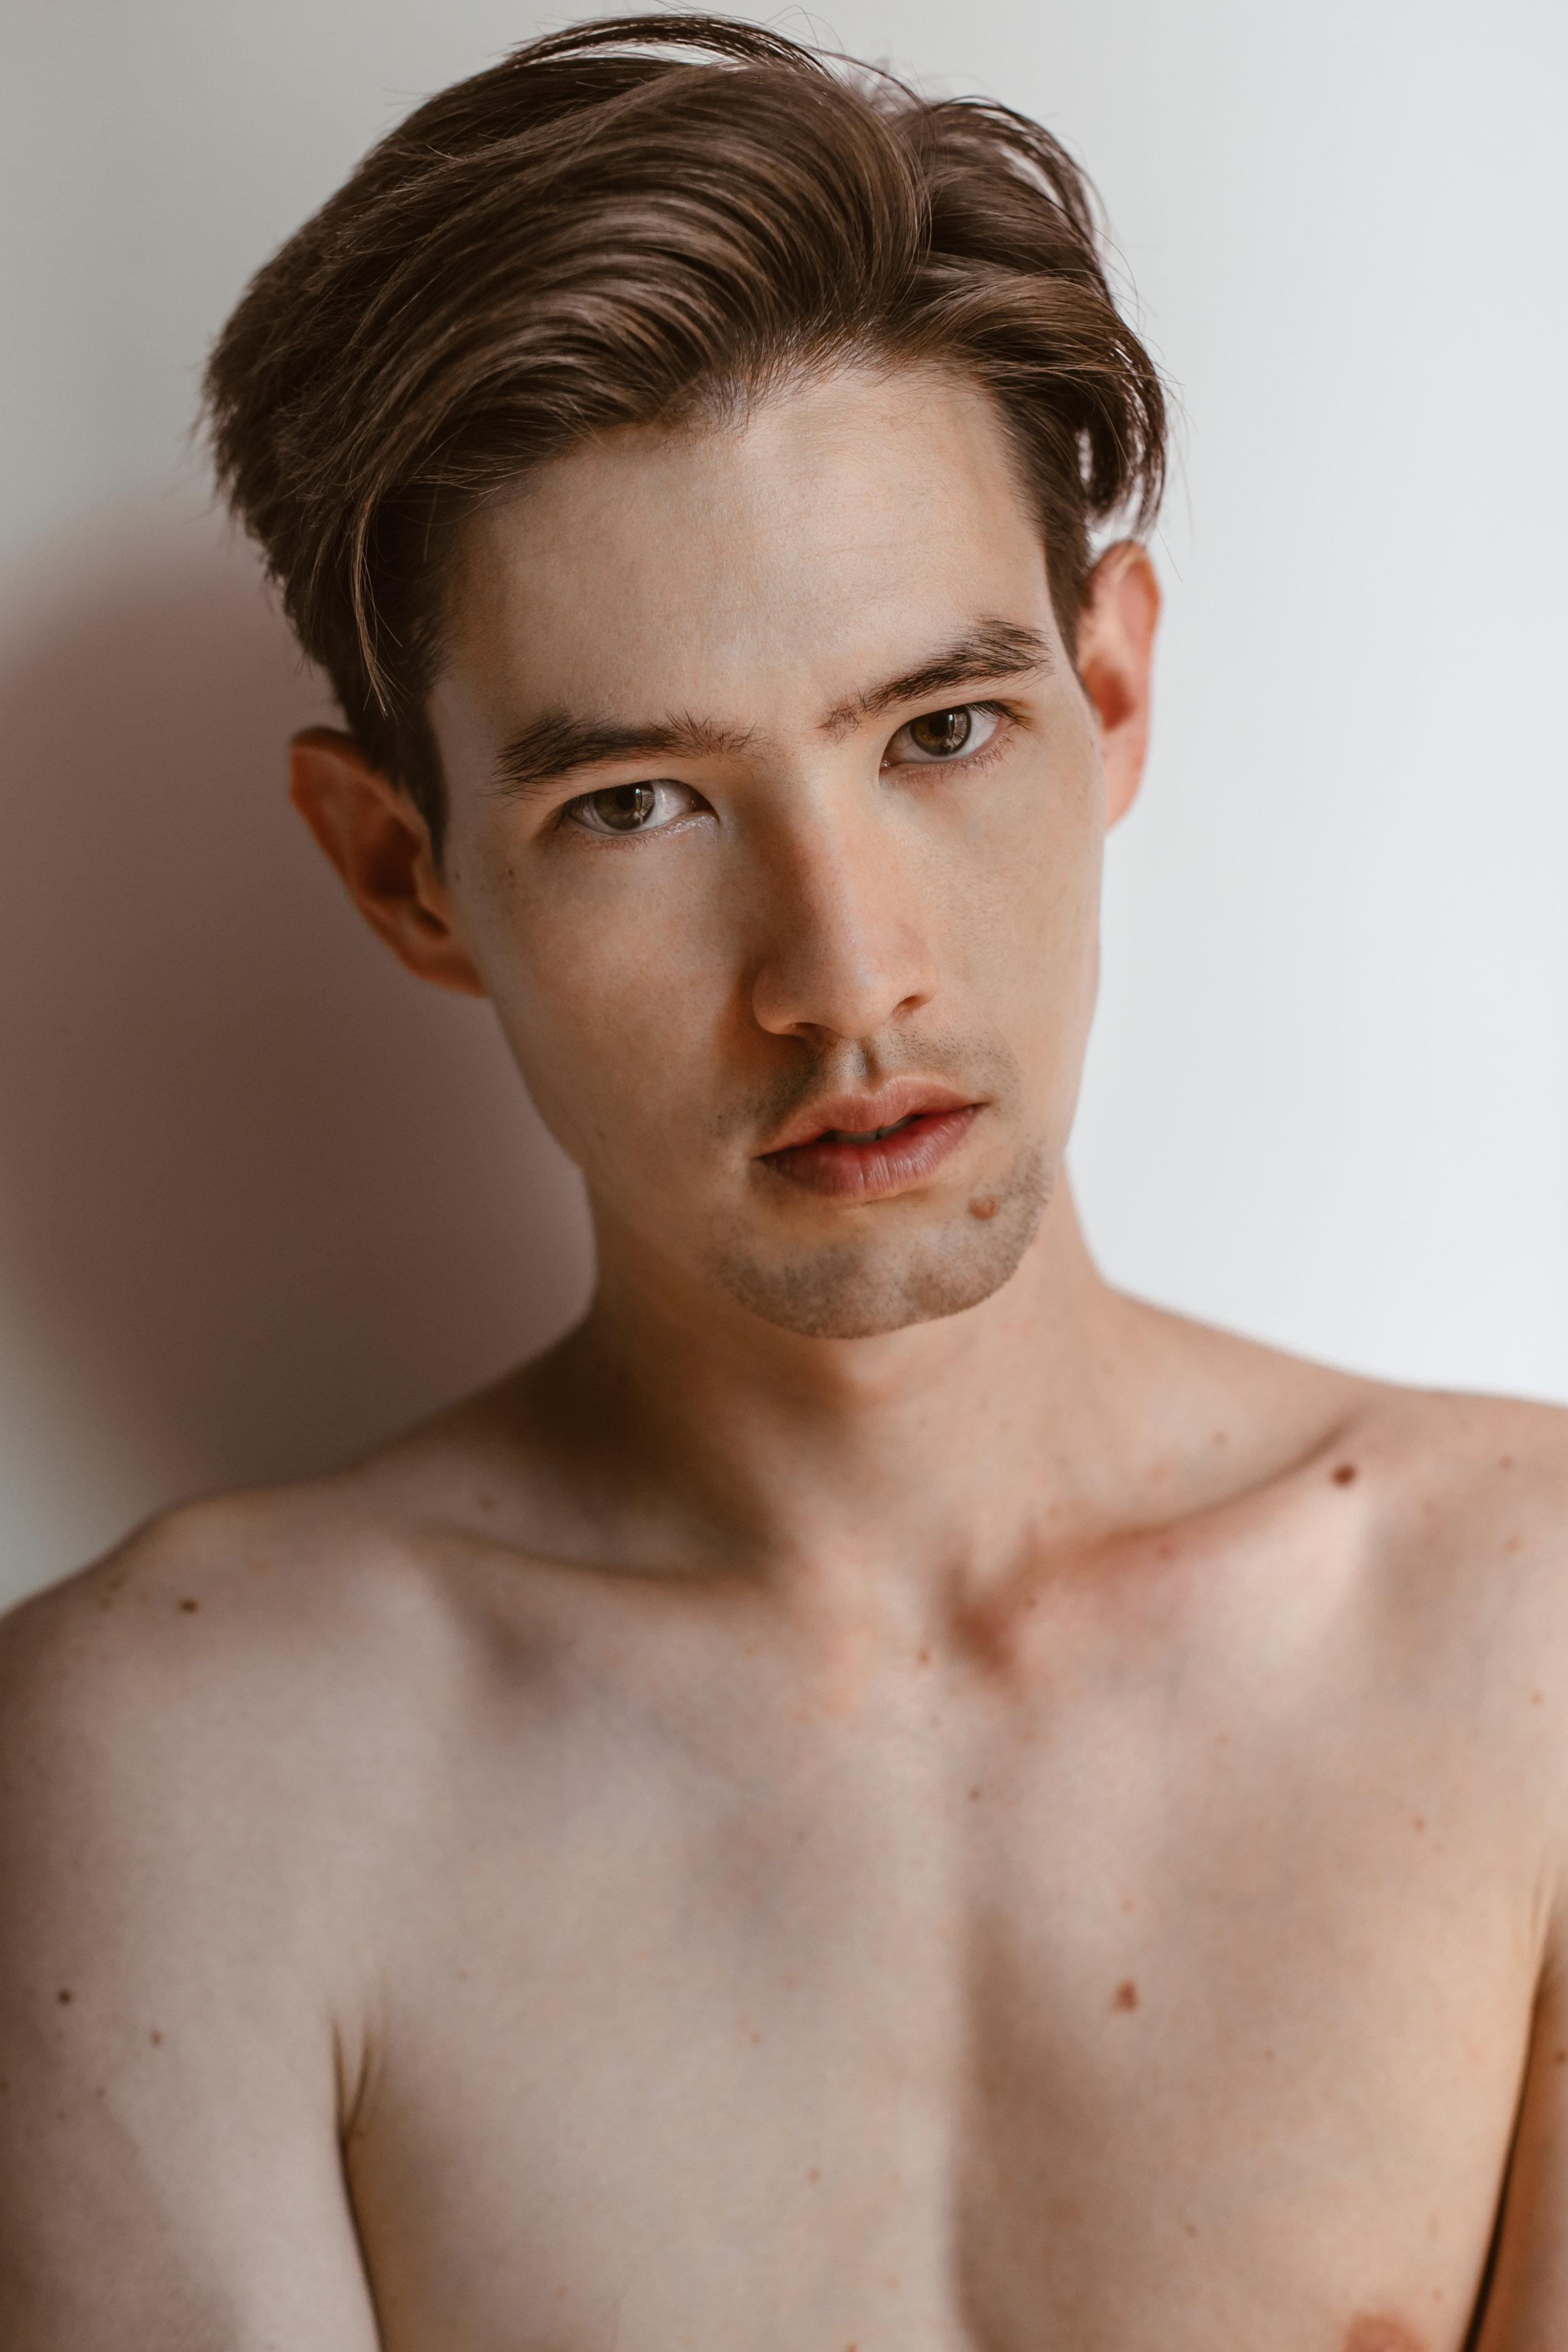 darren wong photography portrait jacob hirata quest model hong kong